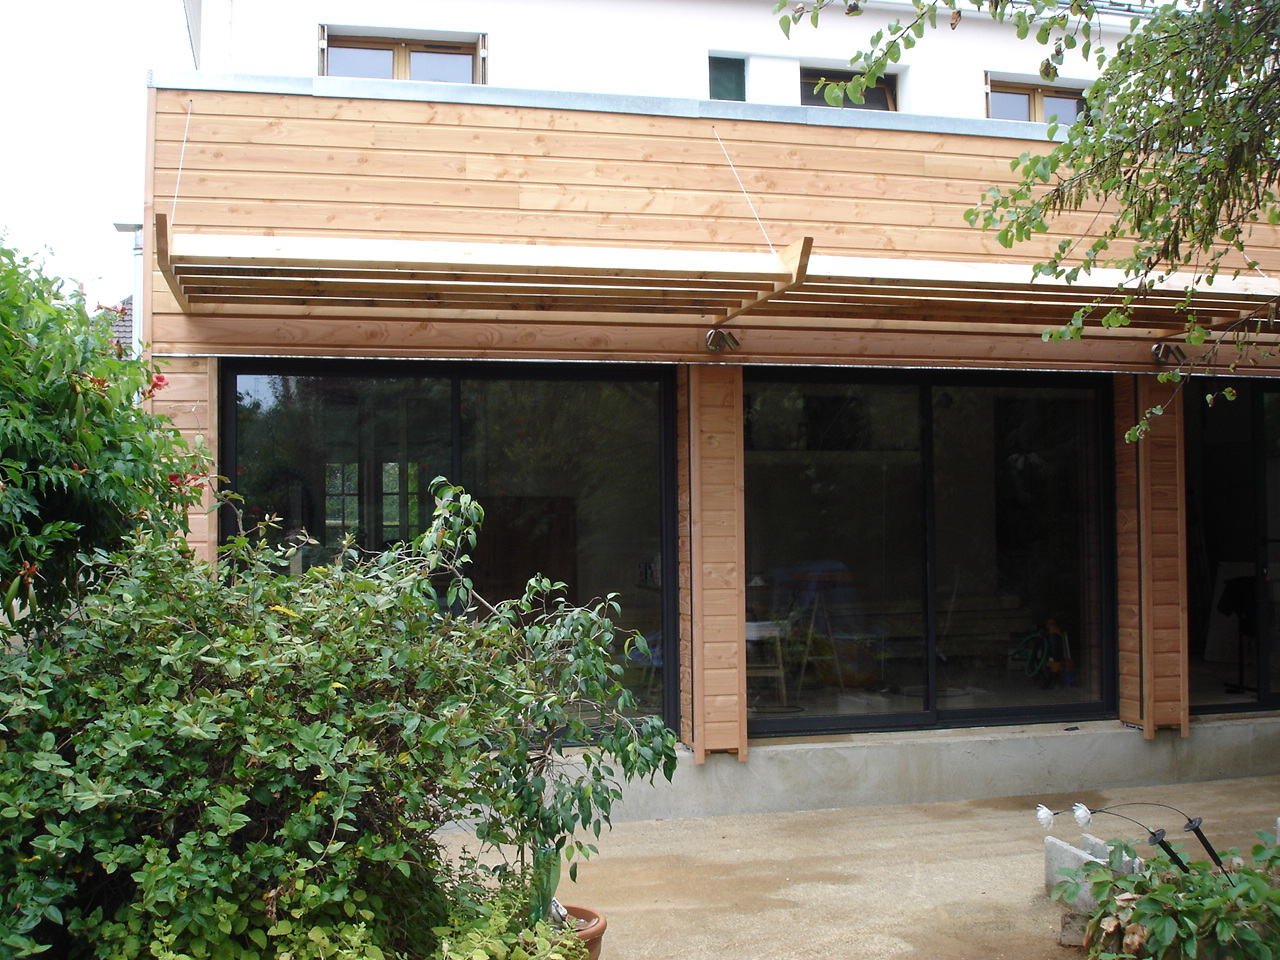 autoconstruction extension ossature bois. Black Bedroom Furniture Sets. Home Design Ideas